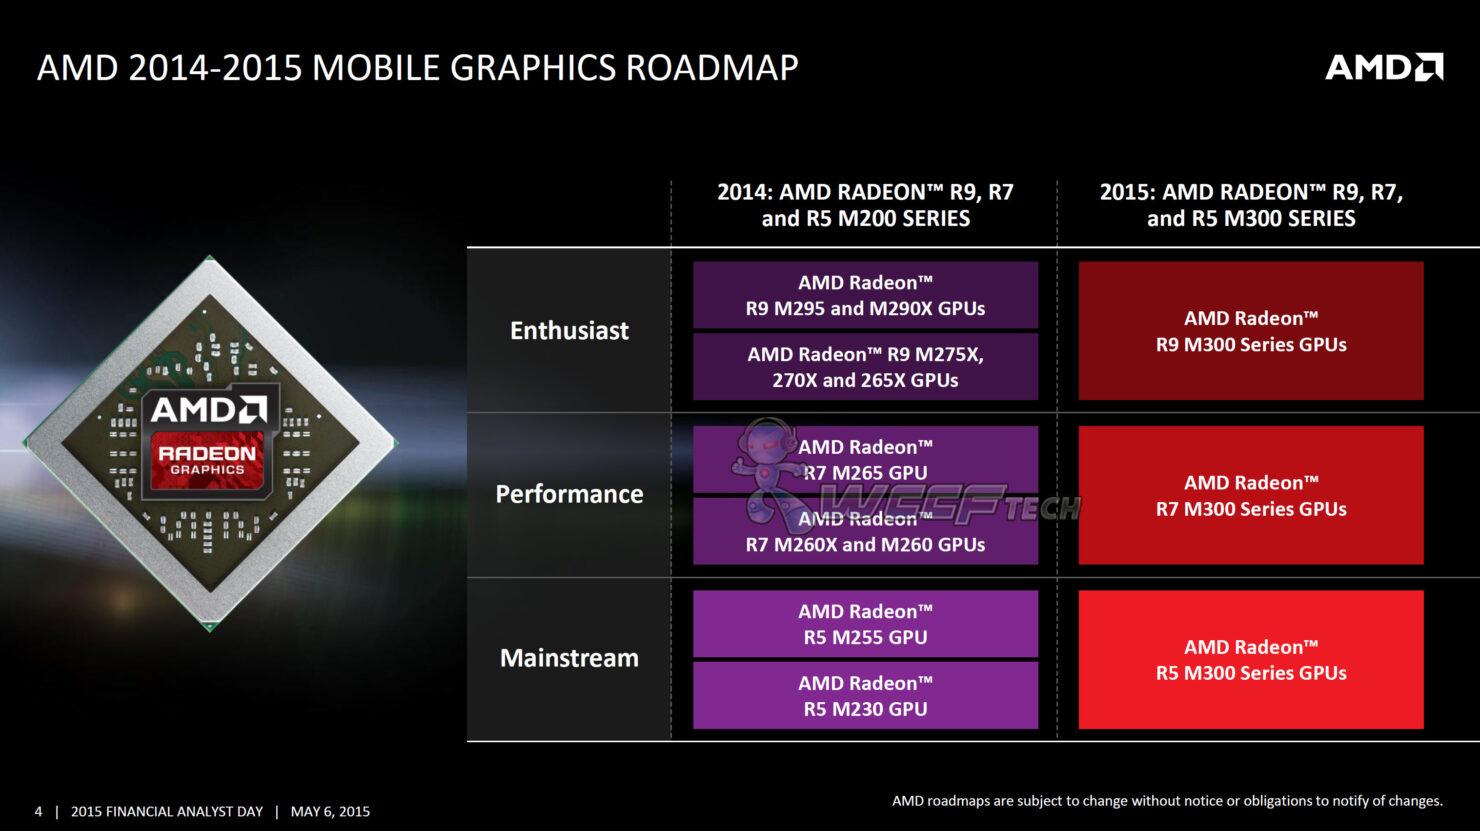 amd-radeon-mobile-graphics-roadmap-2014-2015-2